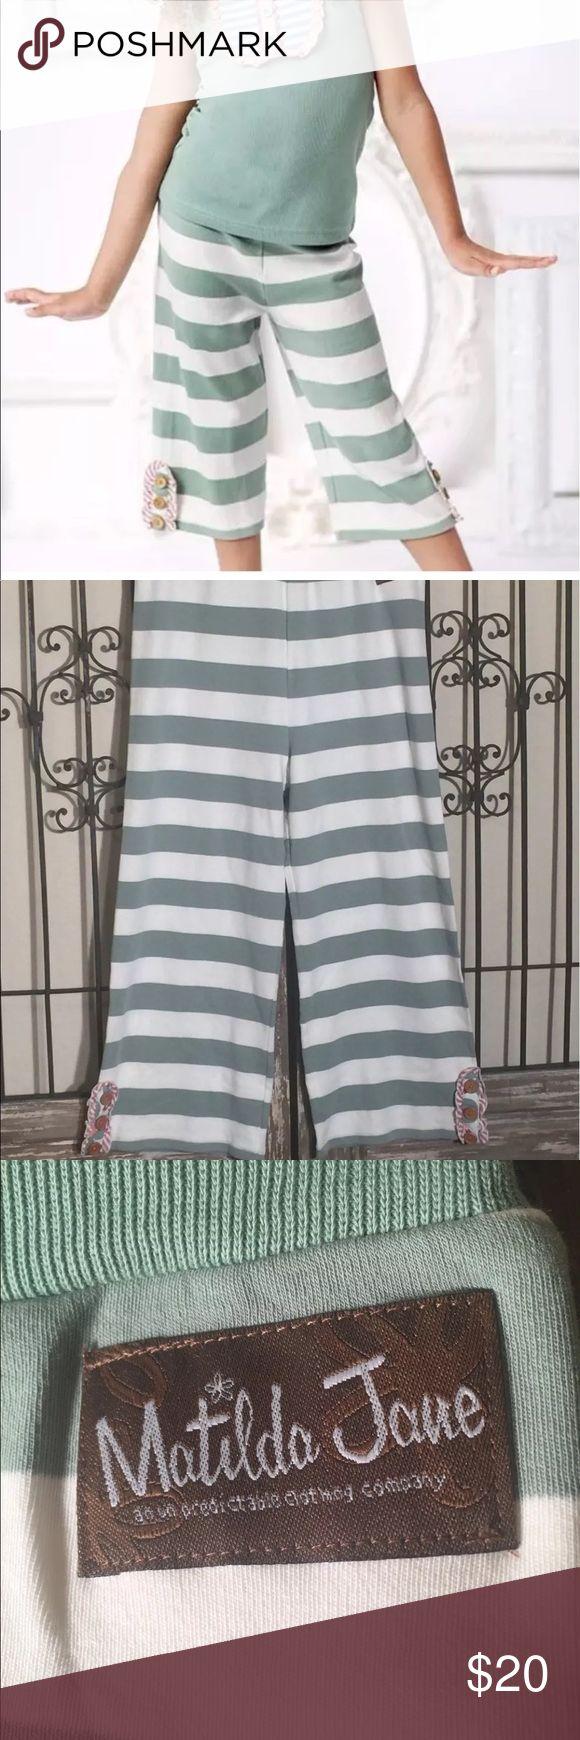 Selling this NWOT Matilda Jane Catamaran Straitees Tween Sz 14 on Poshmark! My username is: evabizek. #shopmycloset #poshmark #fashion #shopping #style #forsale #matilda jane #Other